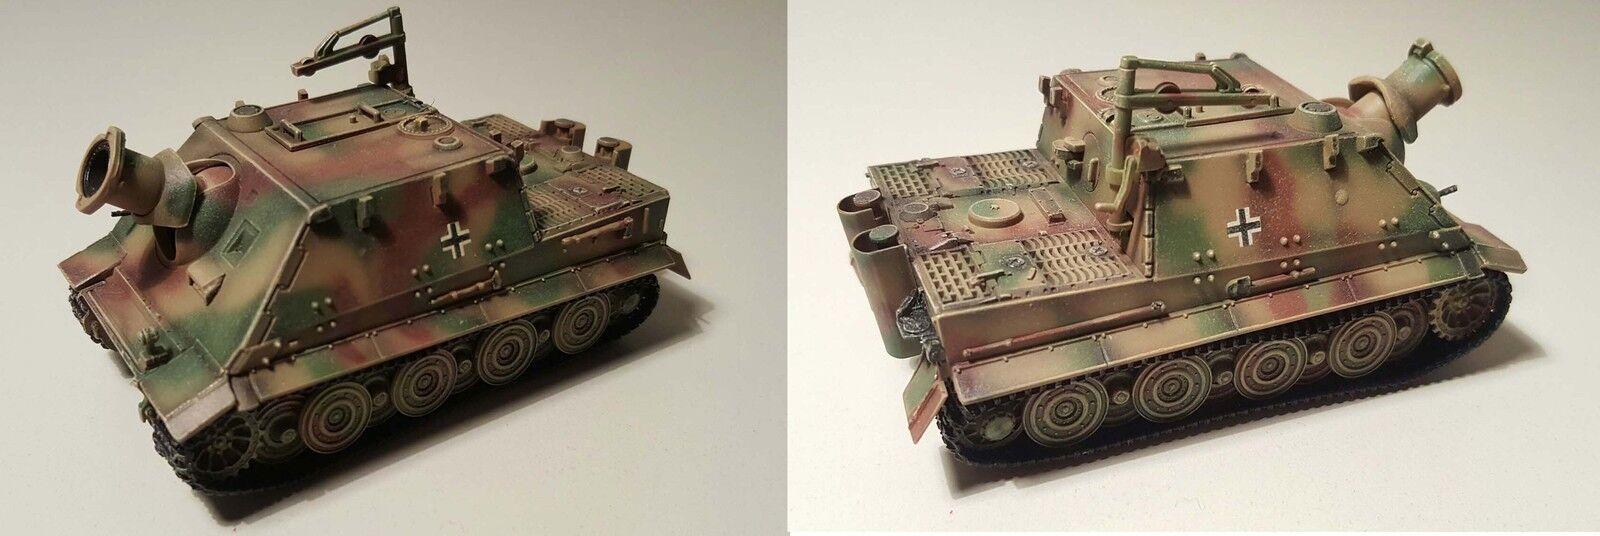 DRAGON ARMOR 1 72 Sturmtiger, 1001st Sturmmorser Kompanie, Germany 1945 60026